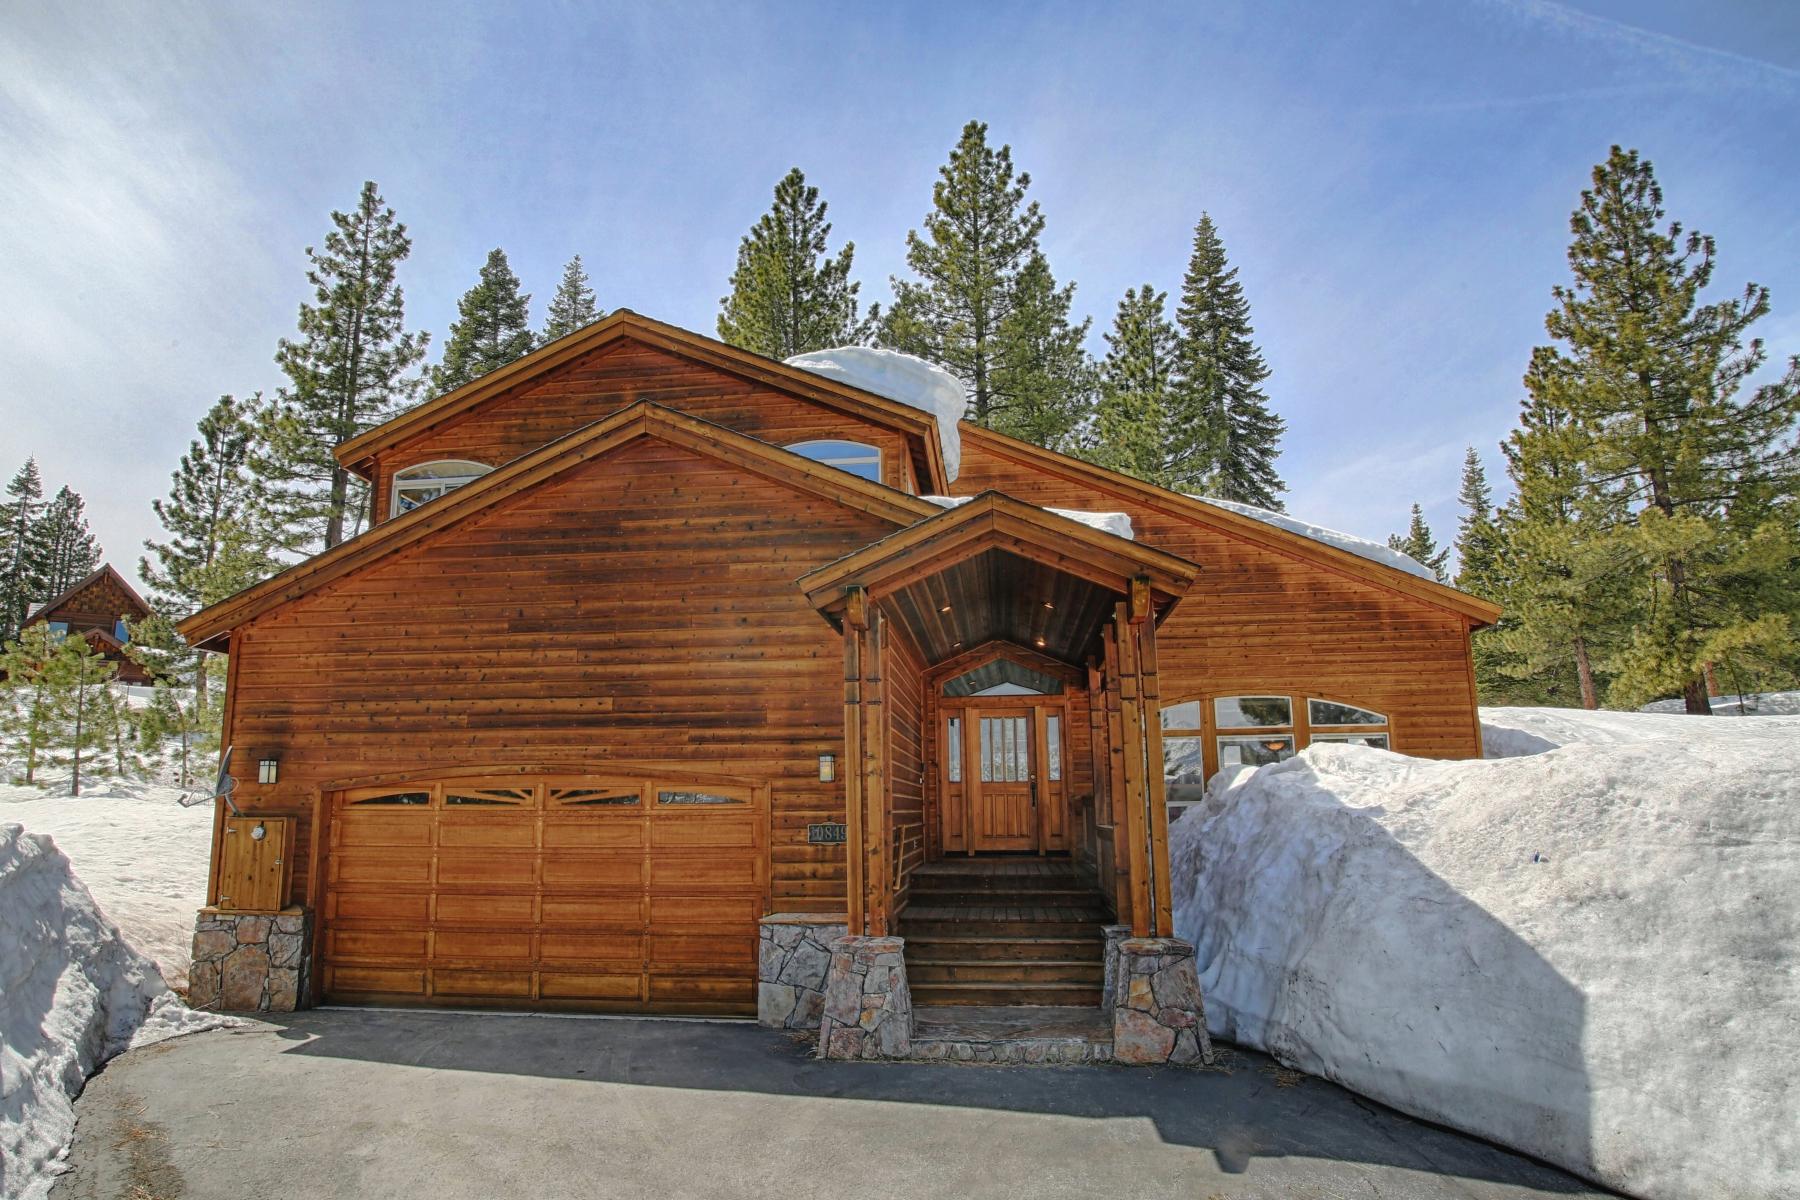 Single Family Home for Active at 10849 Mougle Lane, Truckee, California 96161 Truckee, California 96161 United States